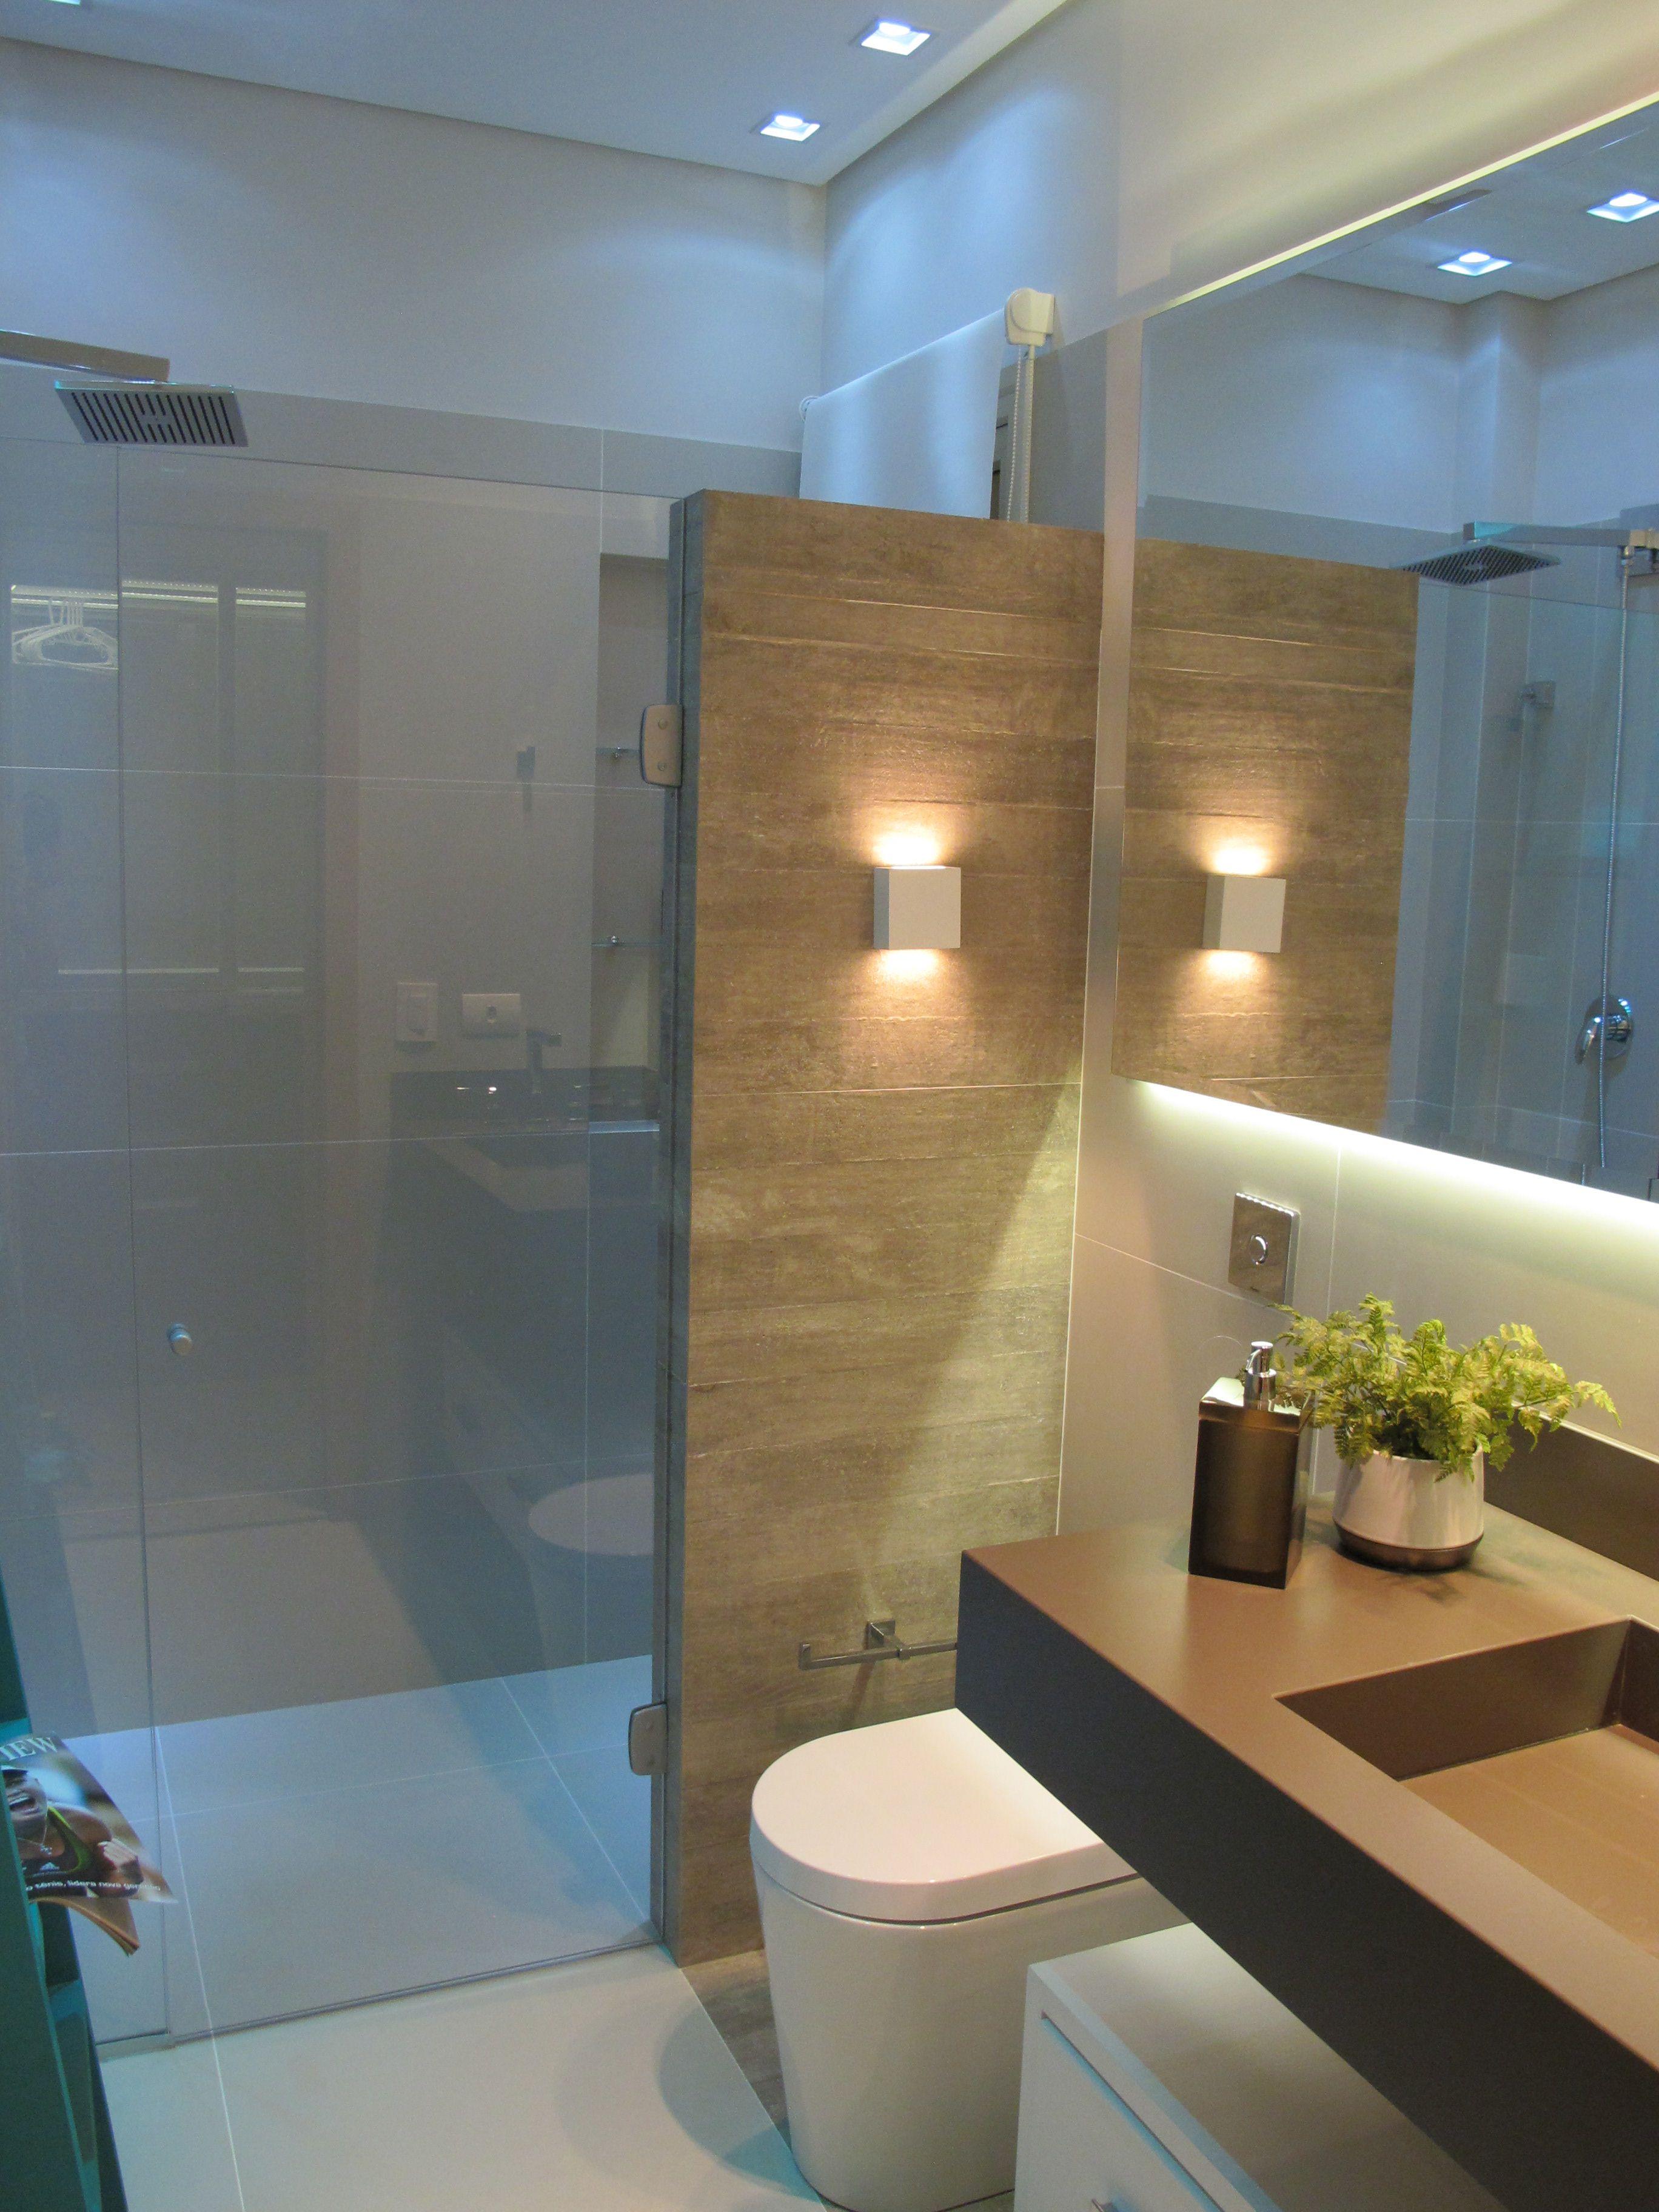 12 Banheiros E Lavabos Com Porcelanato Que Imita Madeira Cuartos De Bano Badezimmerideen Kleine Bader Und Zeitgenossische Badezimmer